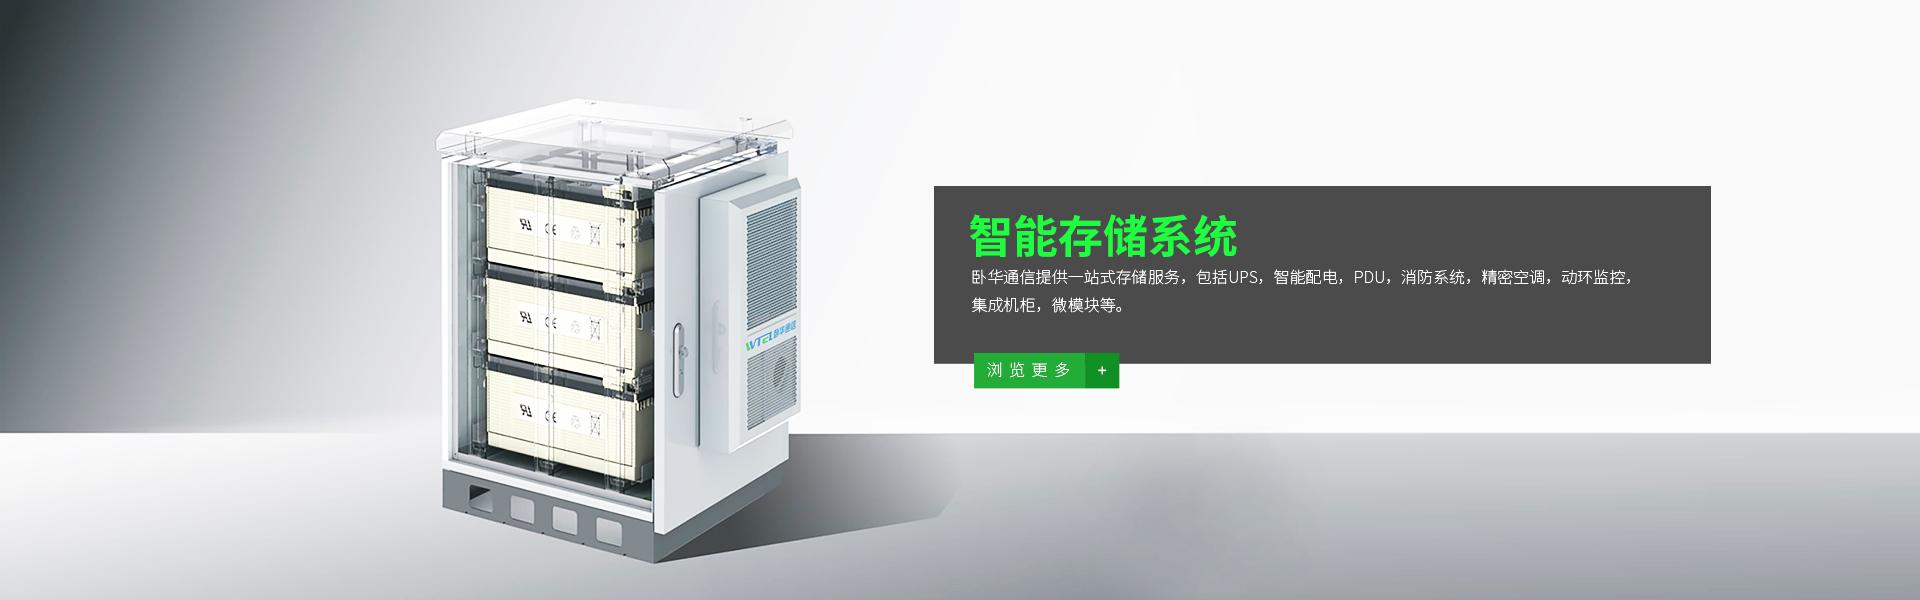 banner04中文